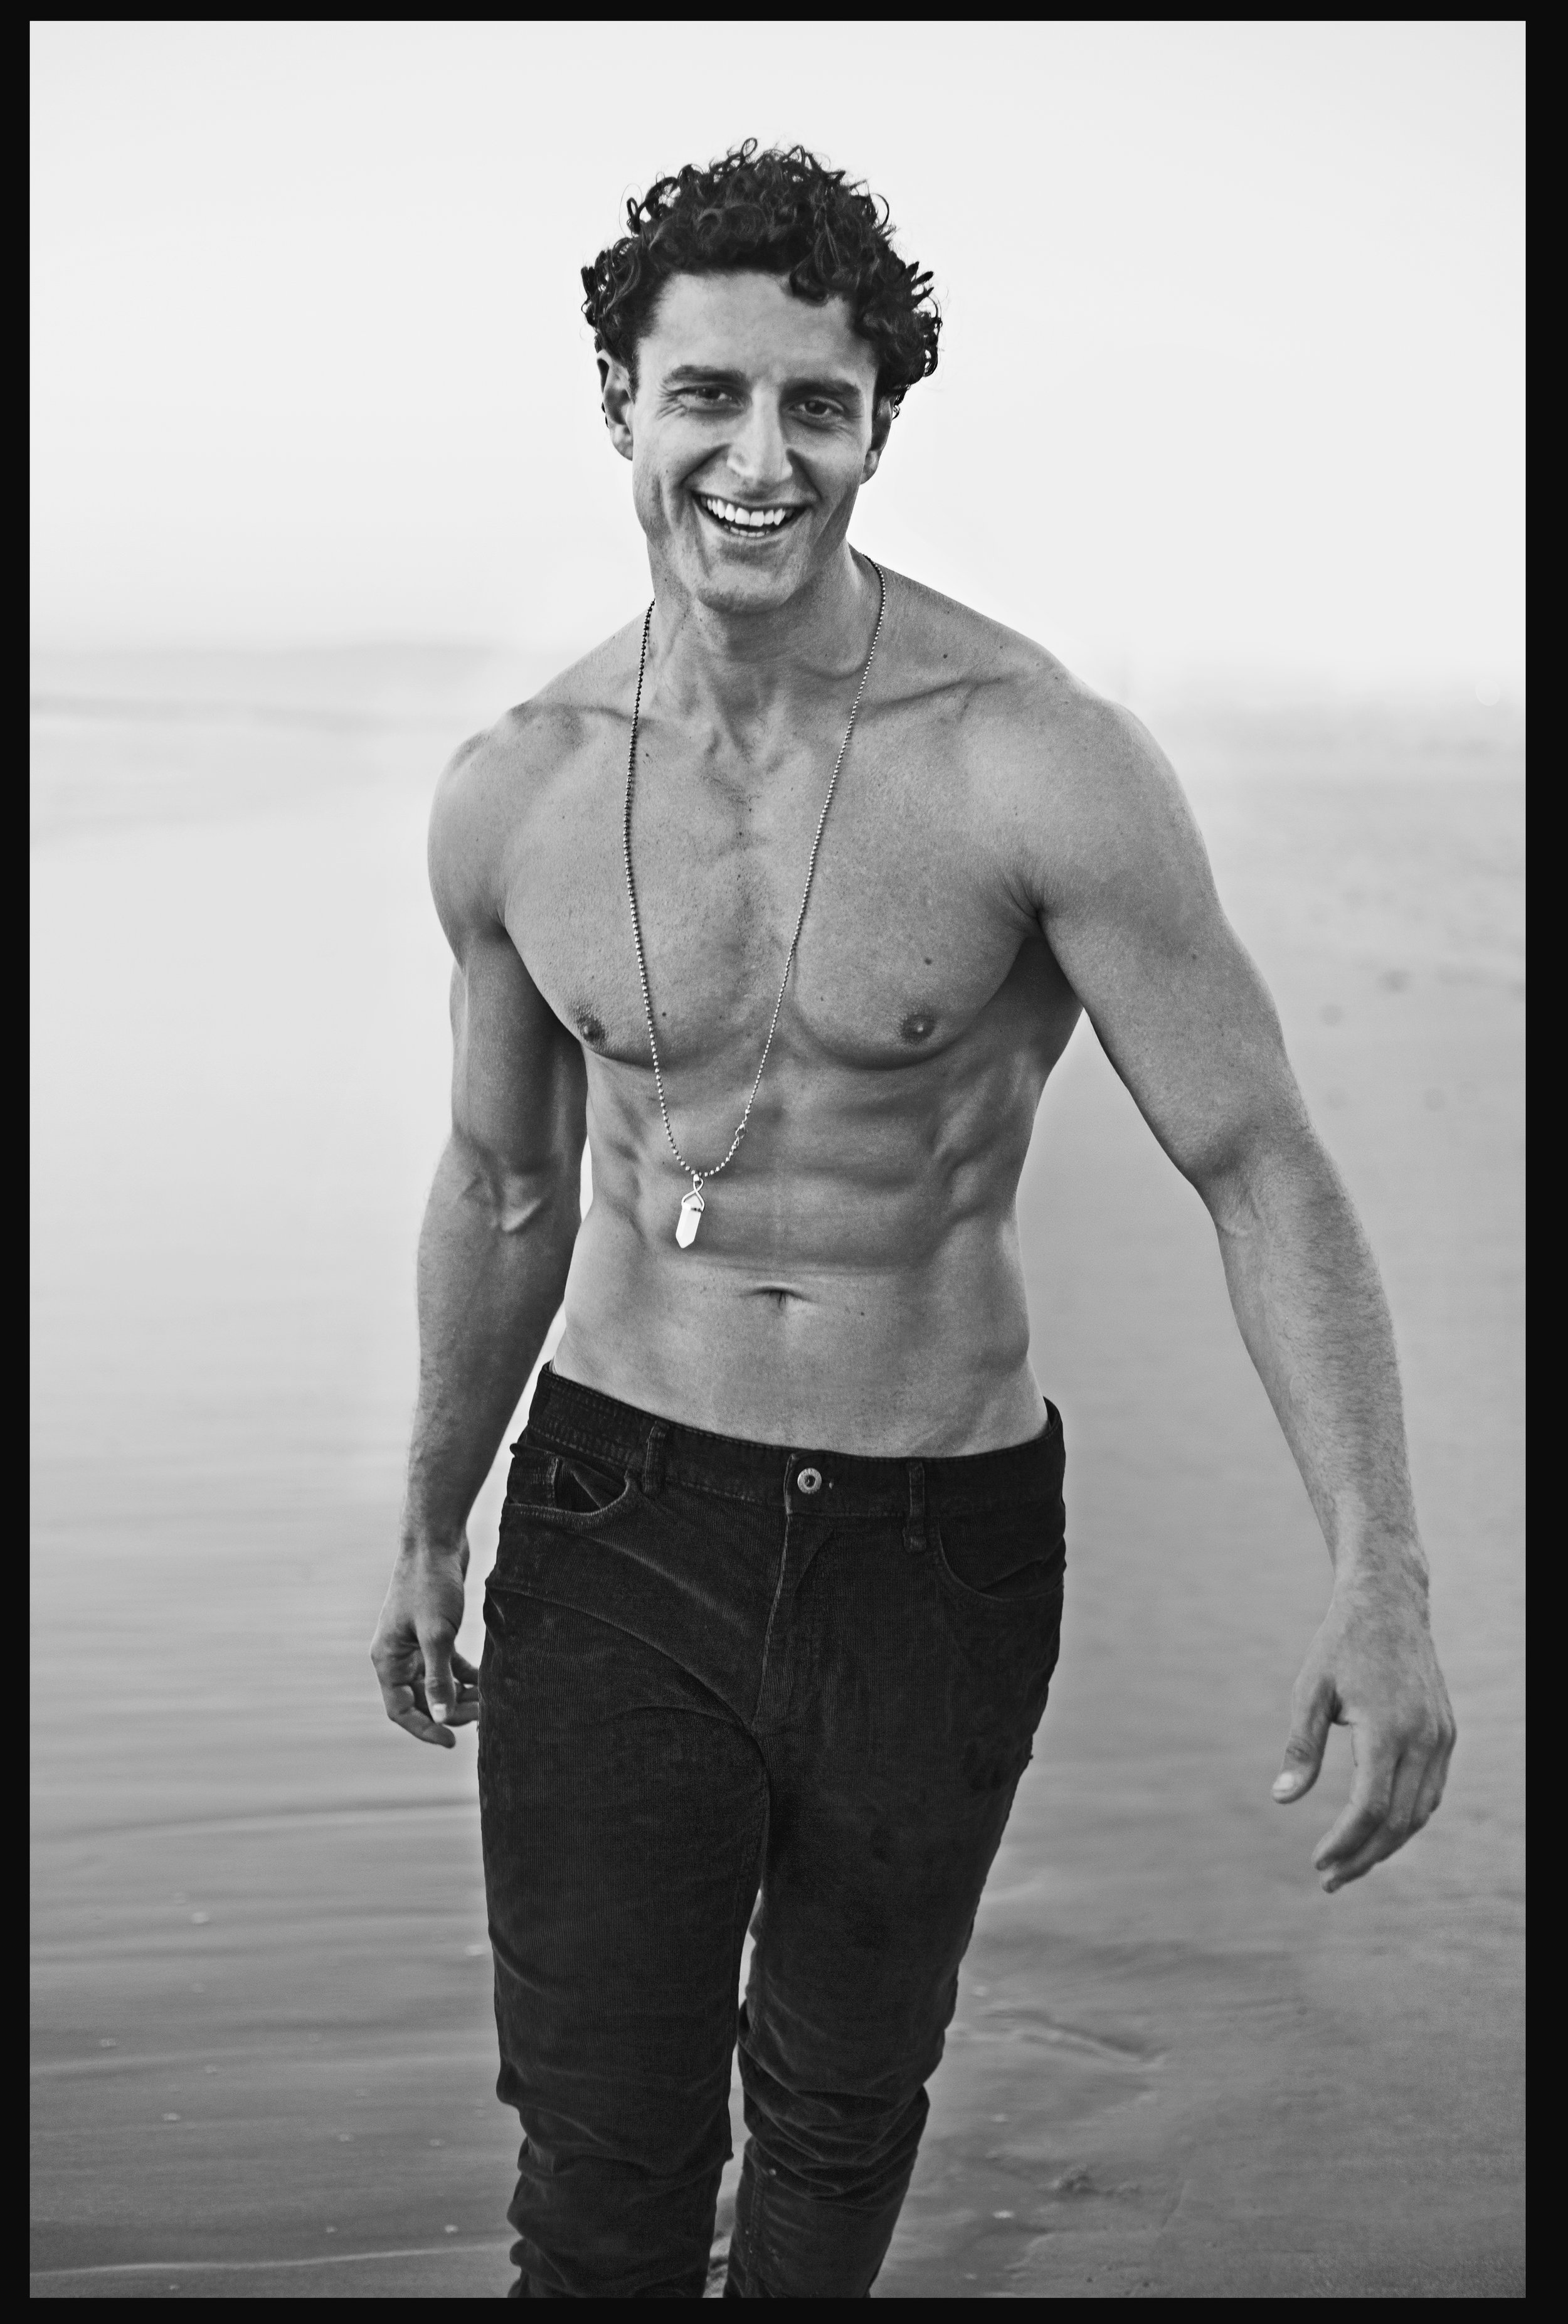 Jacob_Walk_Laugh_Beach_01.jpg